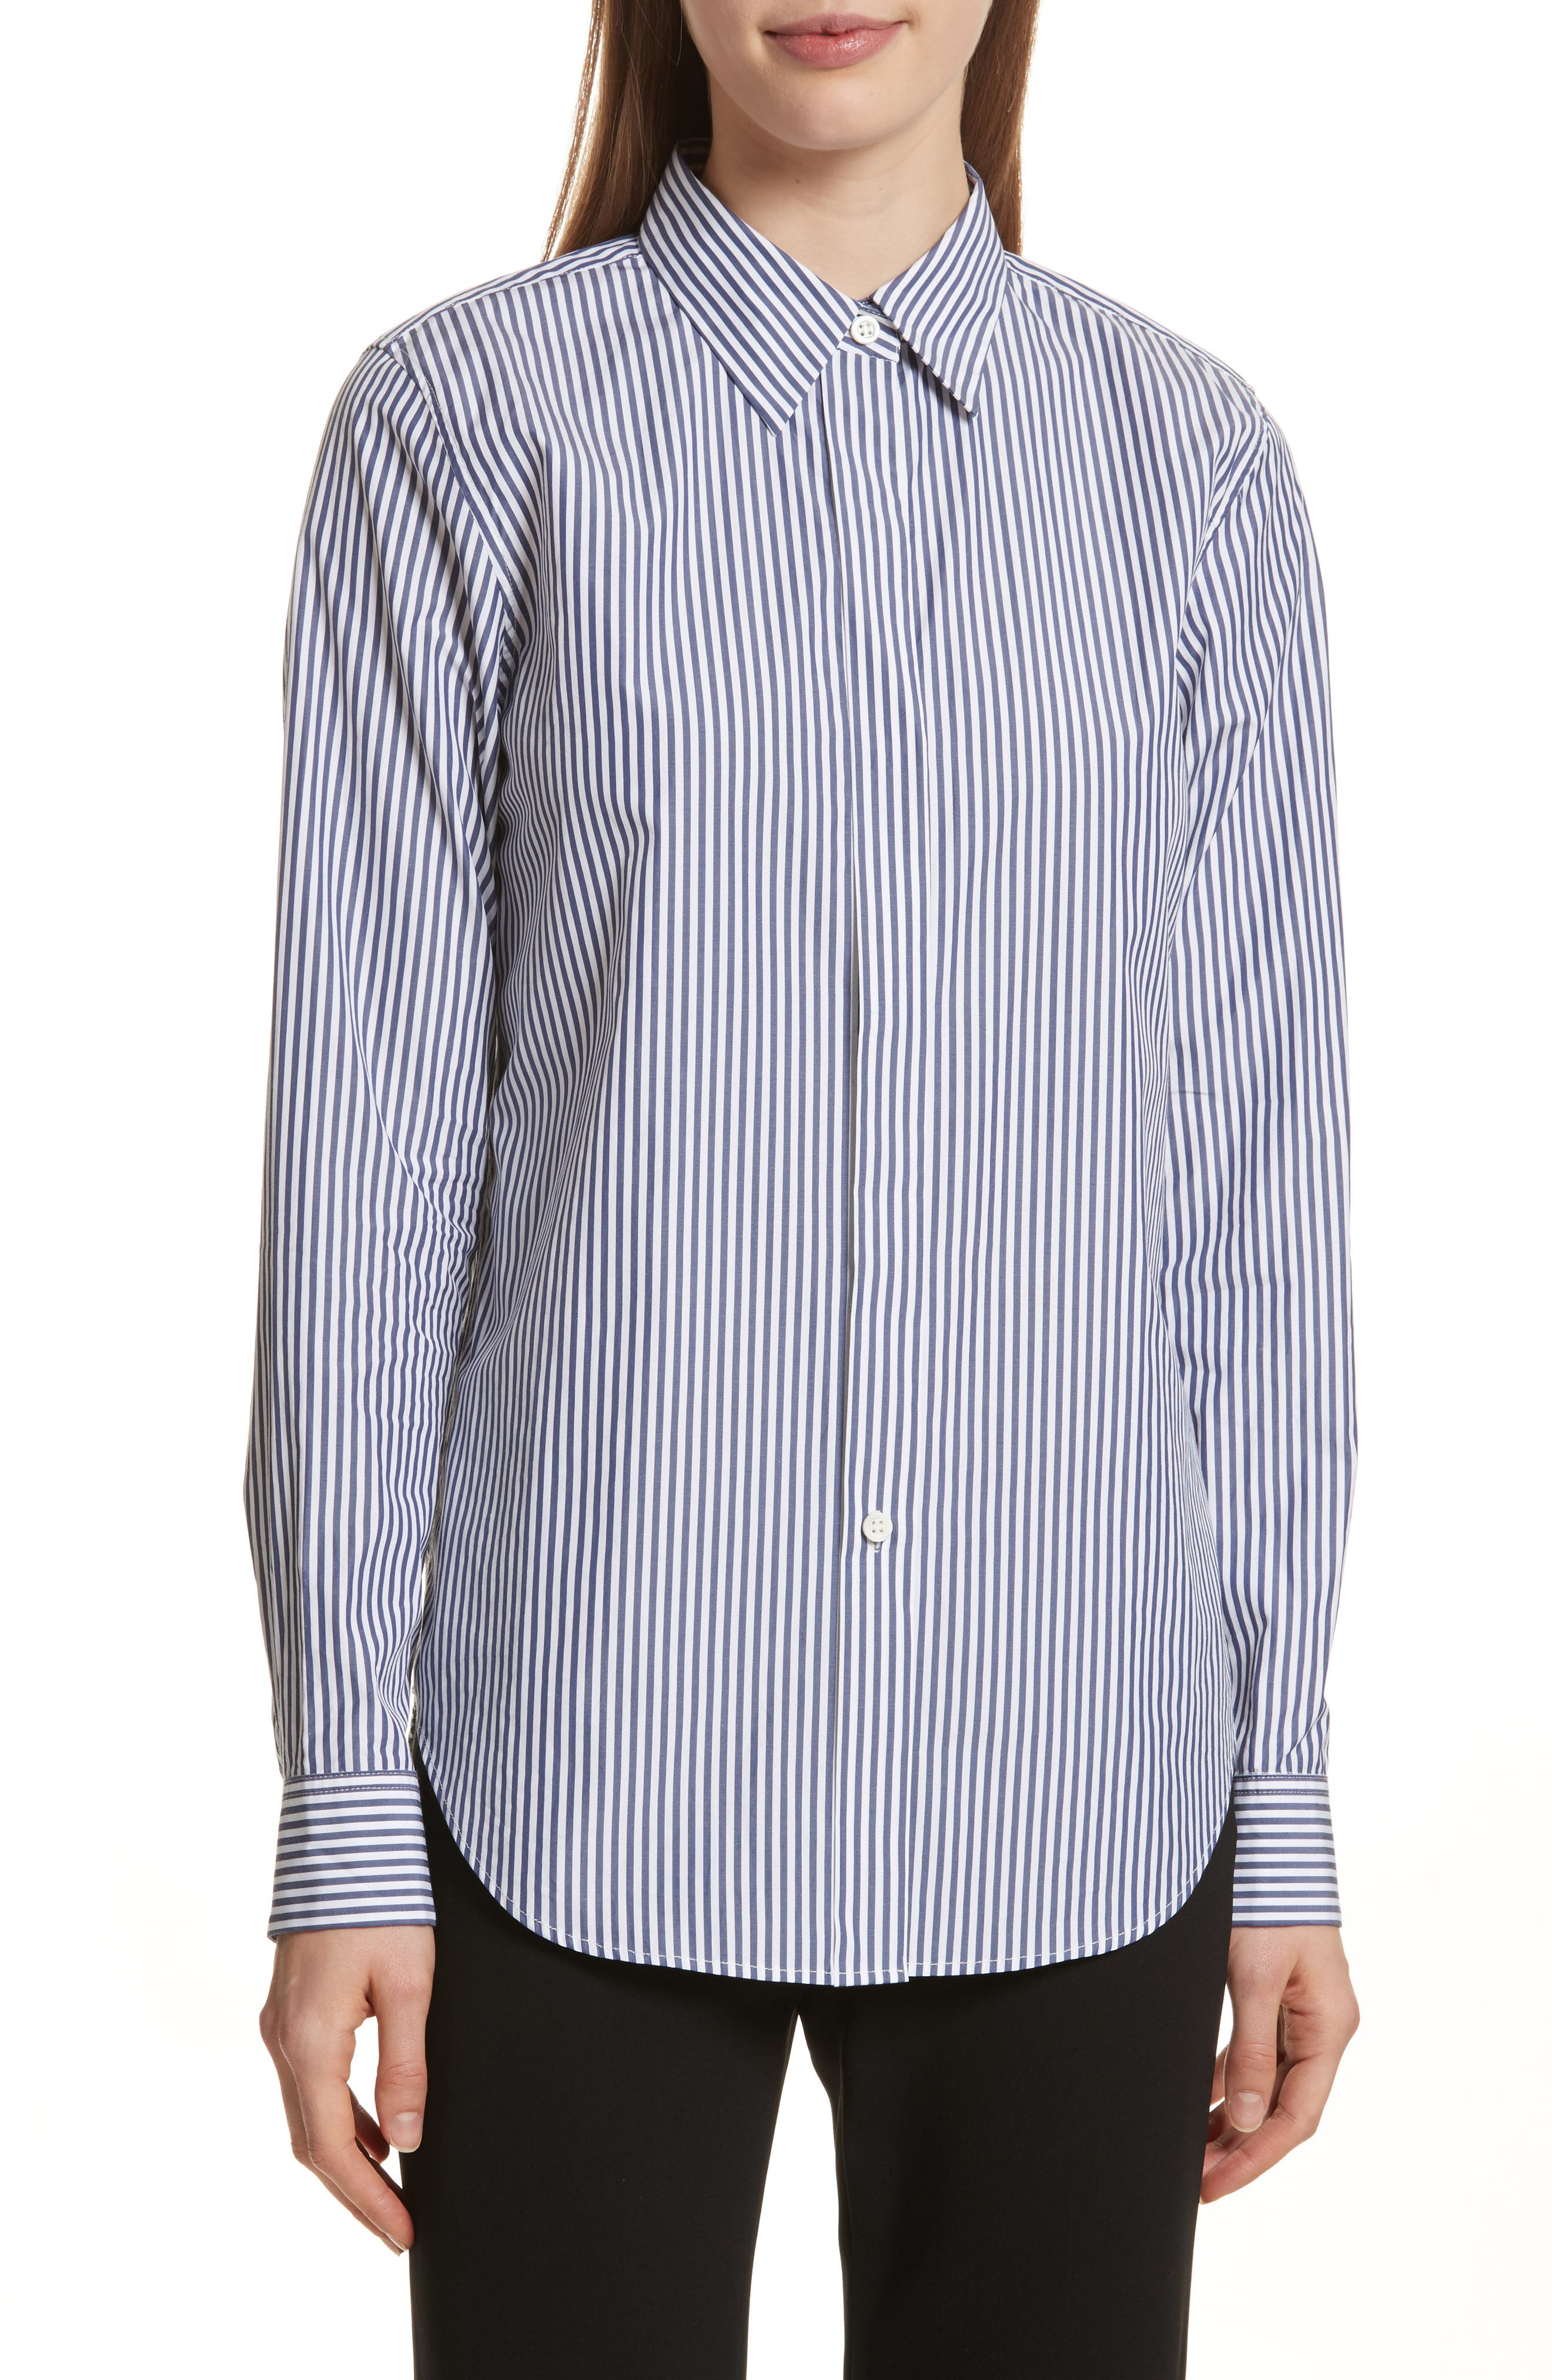 Essential Button Down Cotton Shirt,                             Main thumbnail 1, color,                             Blue/ White